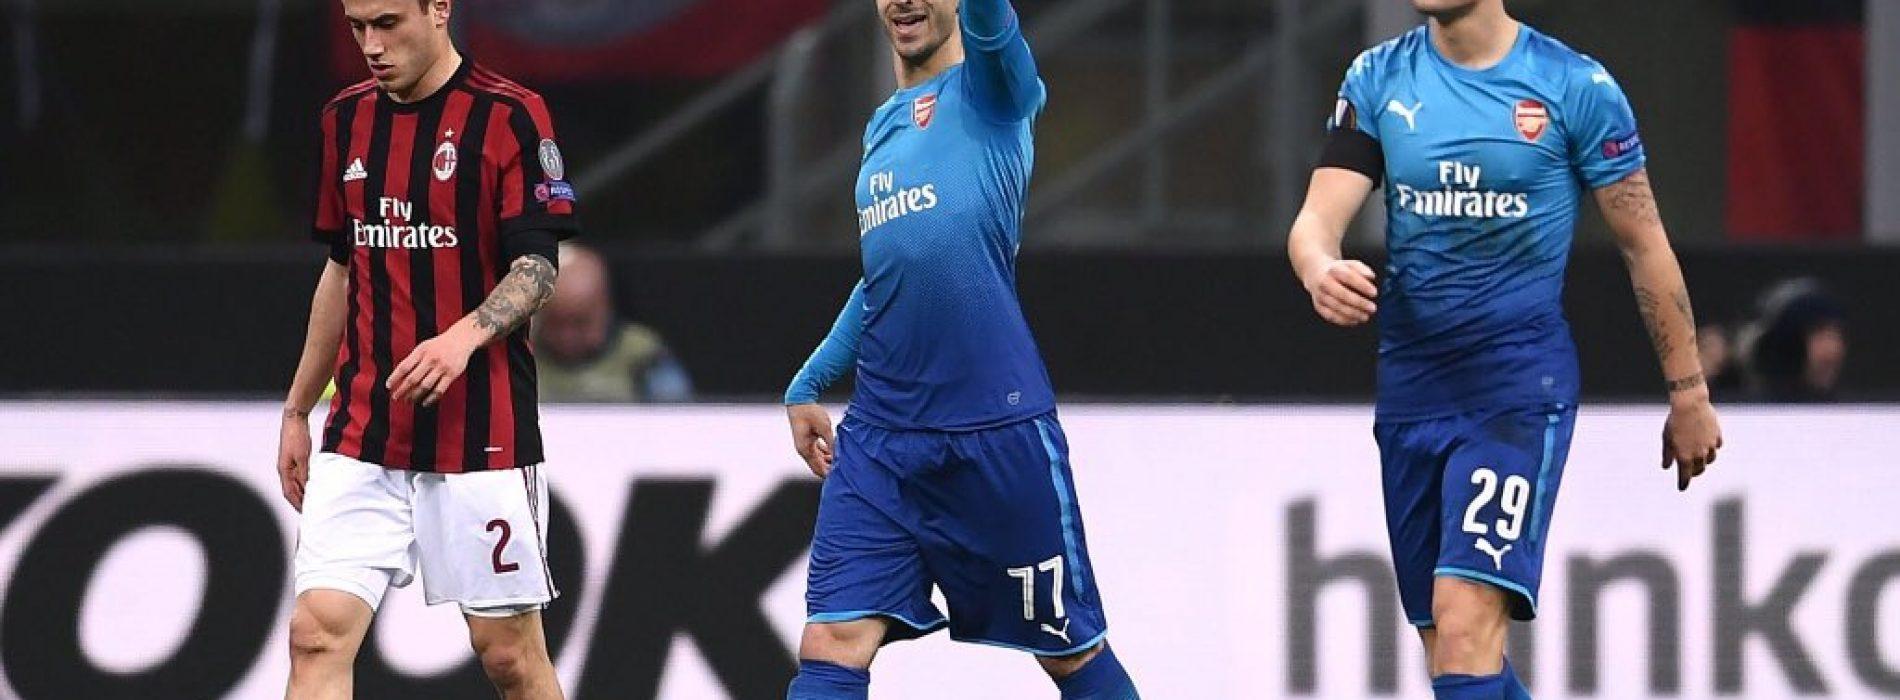 Europa League, Mkhitaryan salta la finale per motivi politici